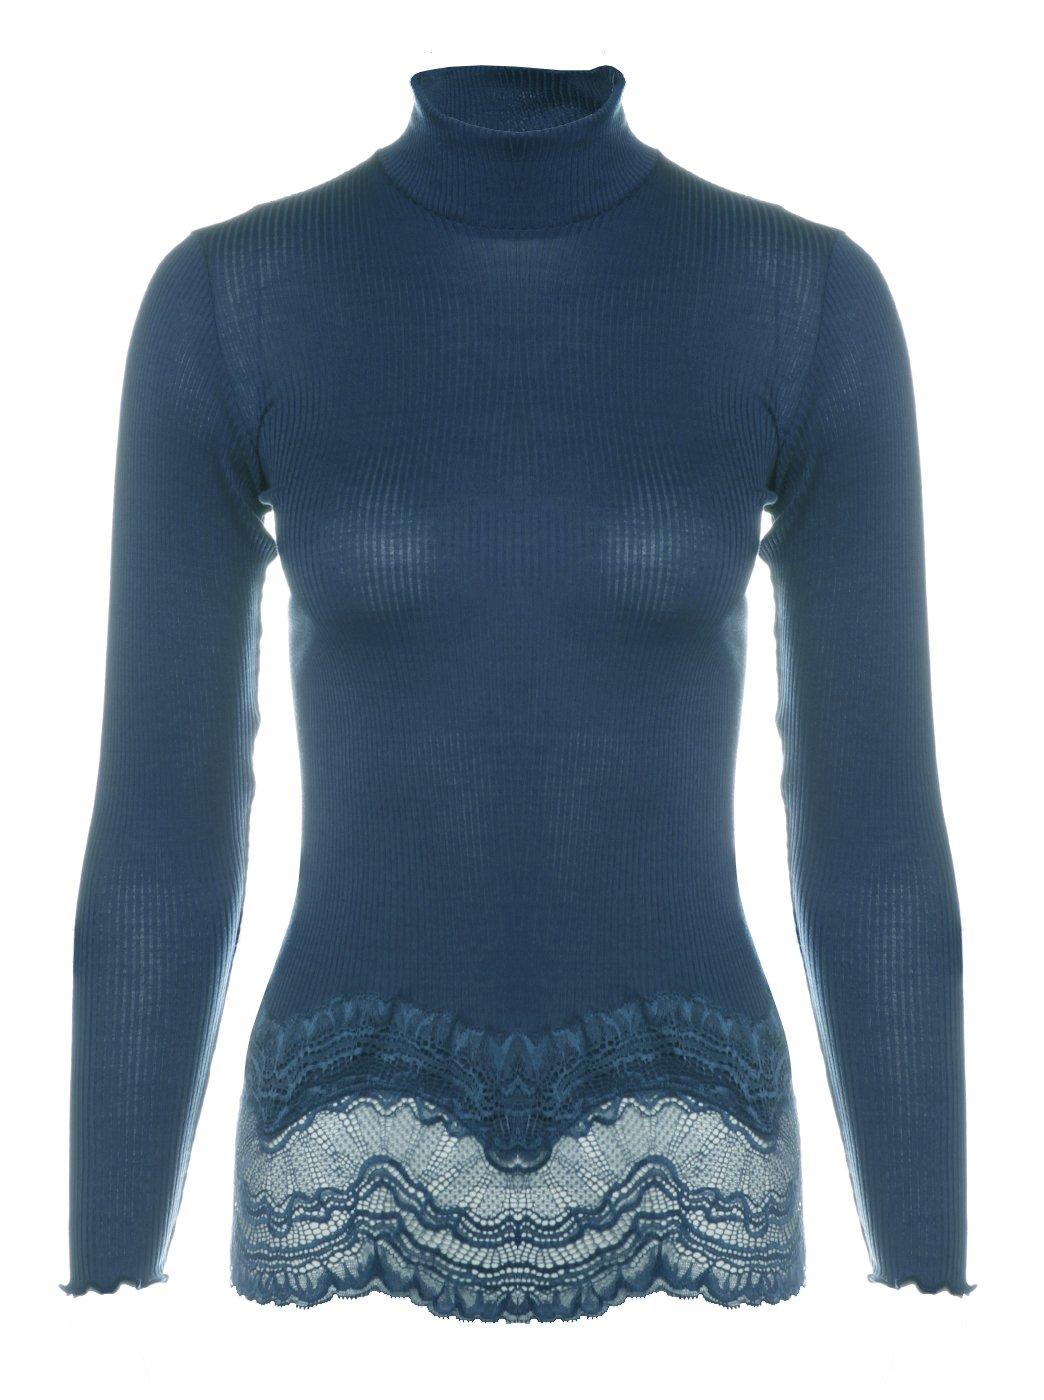 Aimer Women's Soft High Neck String Thermal Long Sleeve Top XS Deep Blue